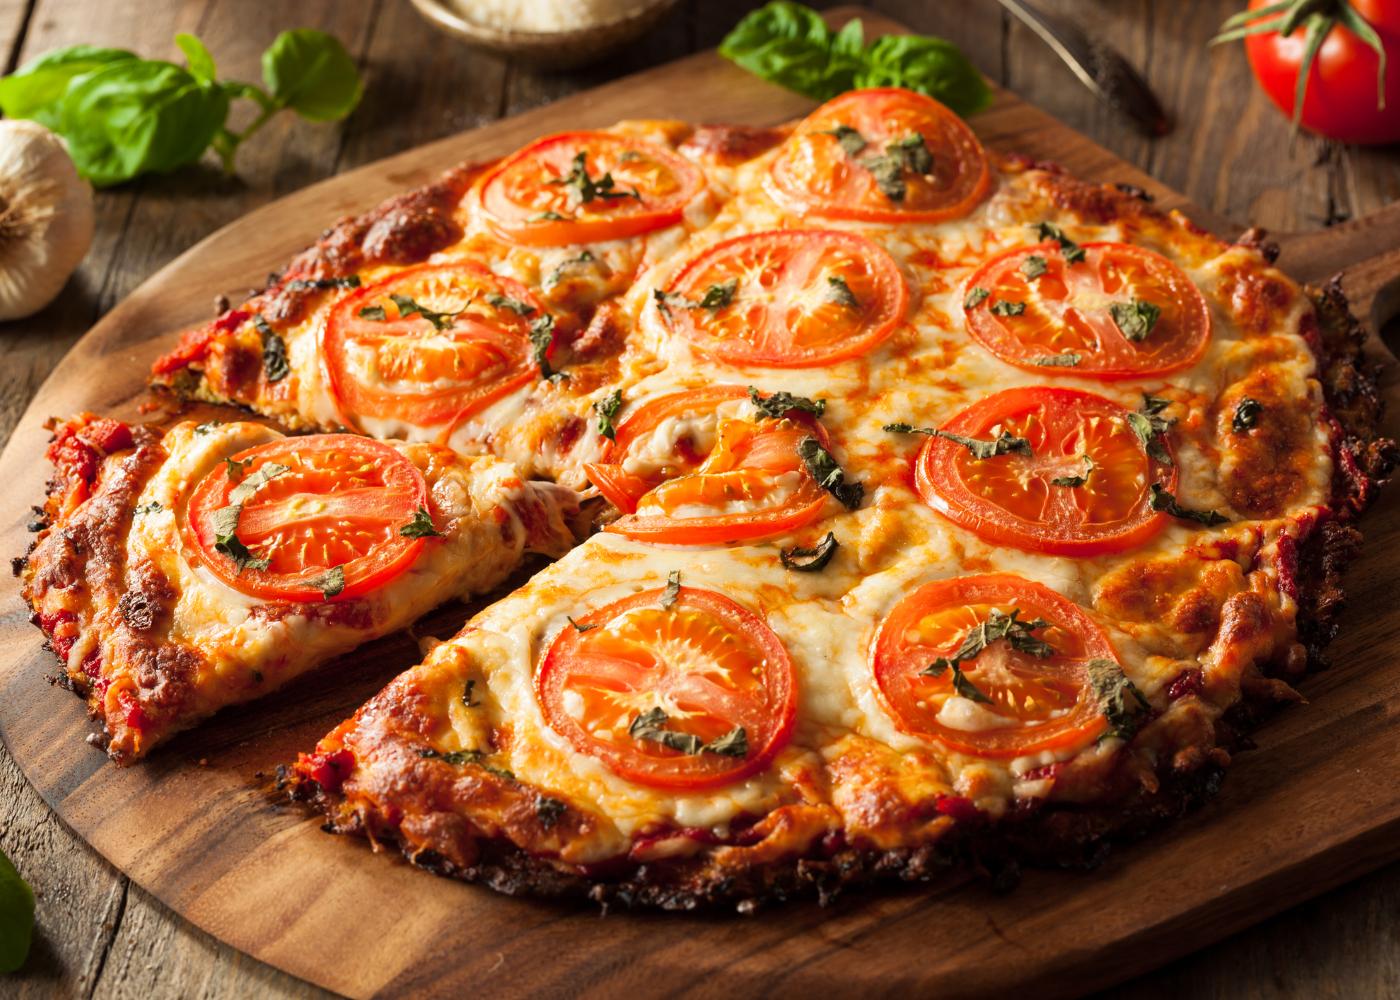 pizza sem glúten com batata-doce e tomate